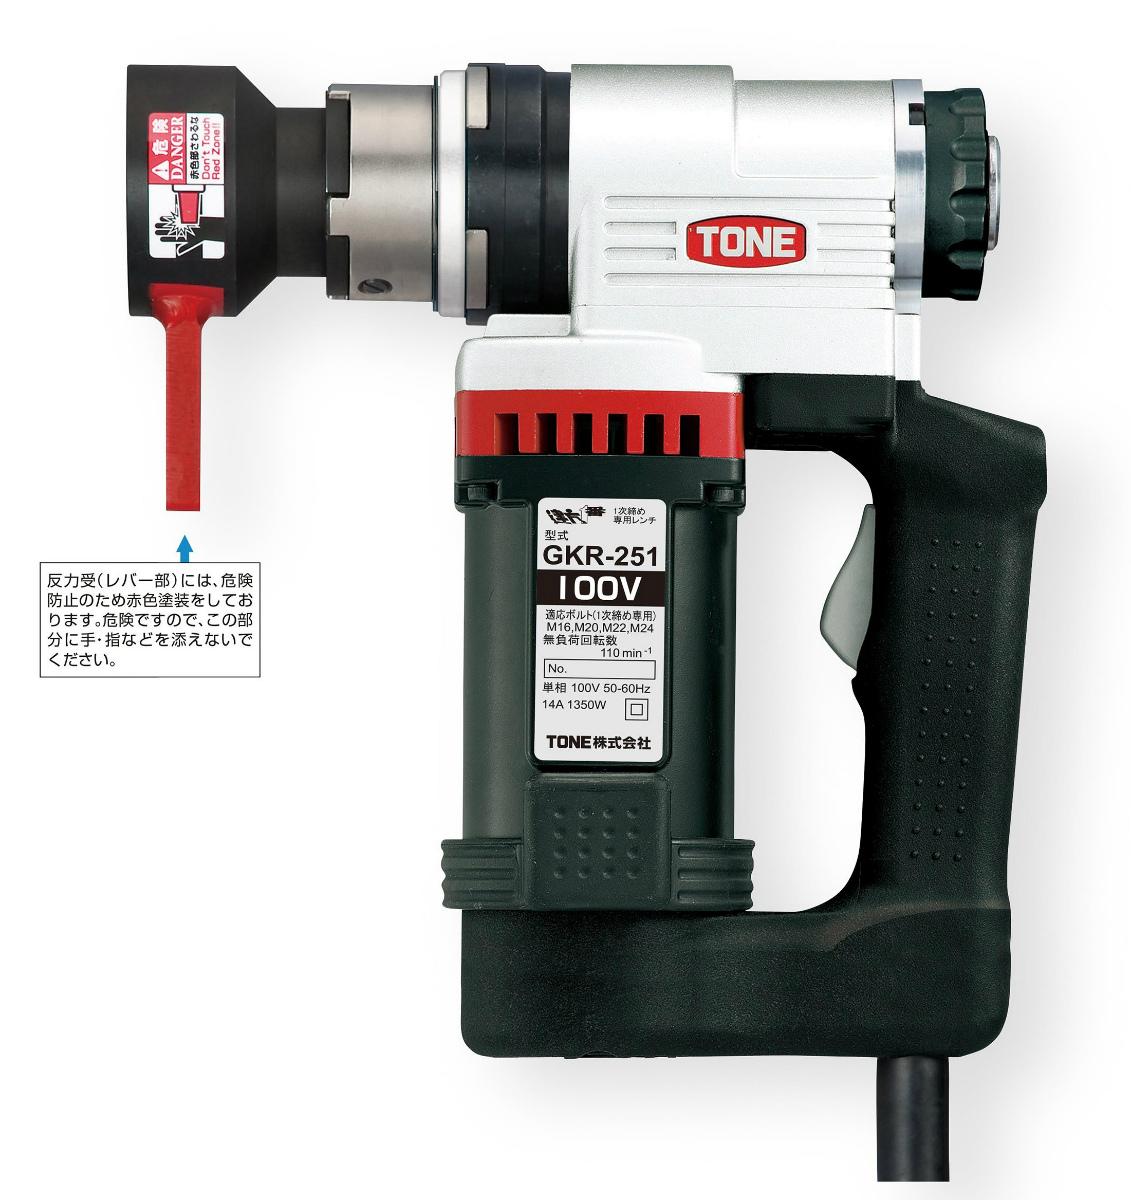 TONE (トネ) 1次締め専用レンチ 建方1番(六角ボルト用) GKR252